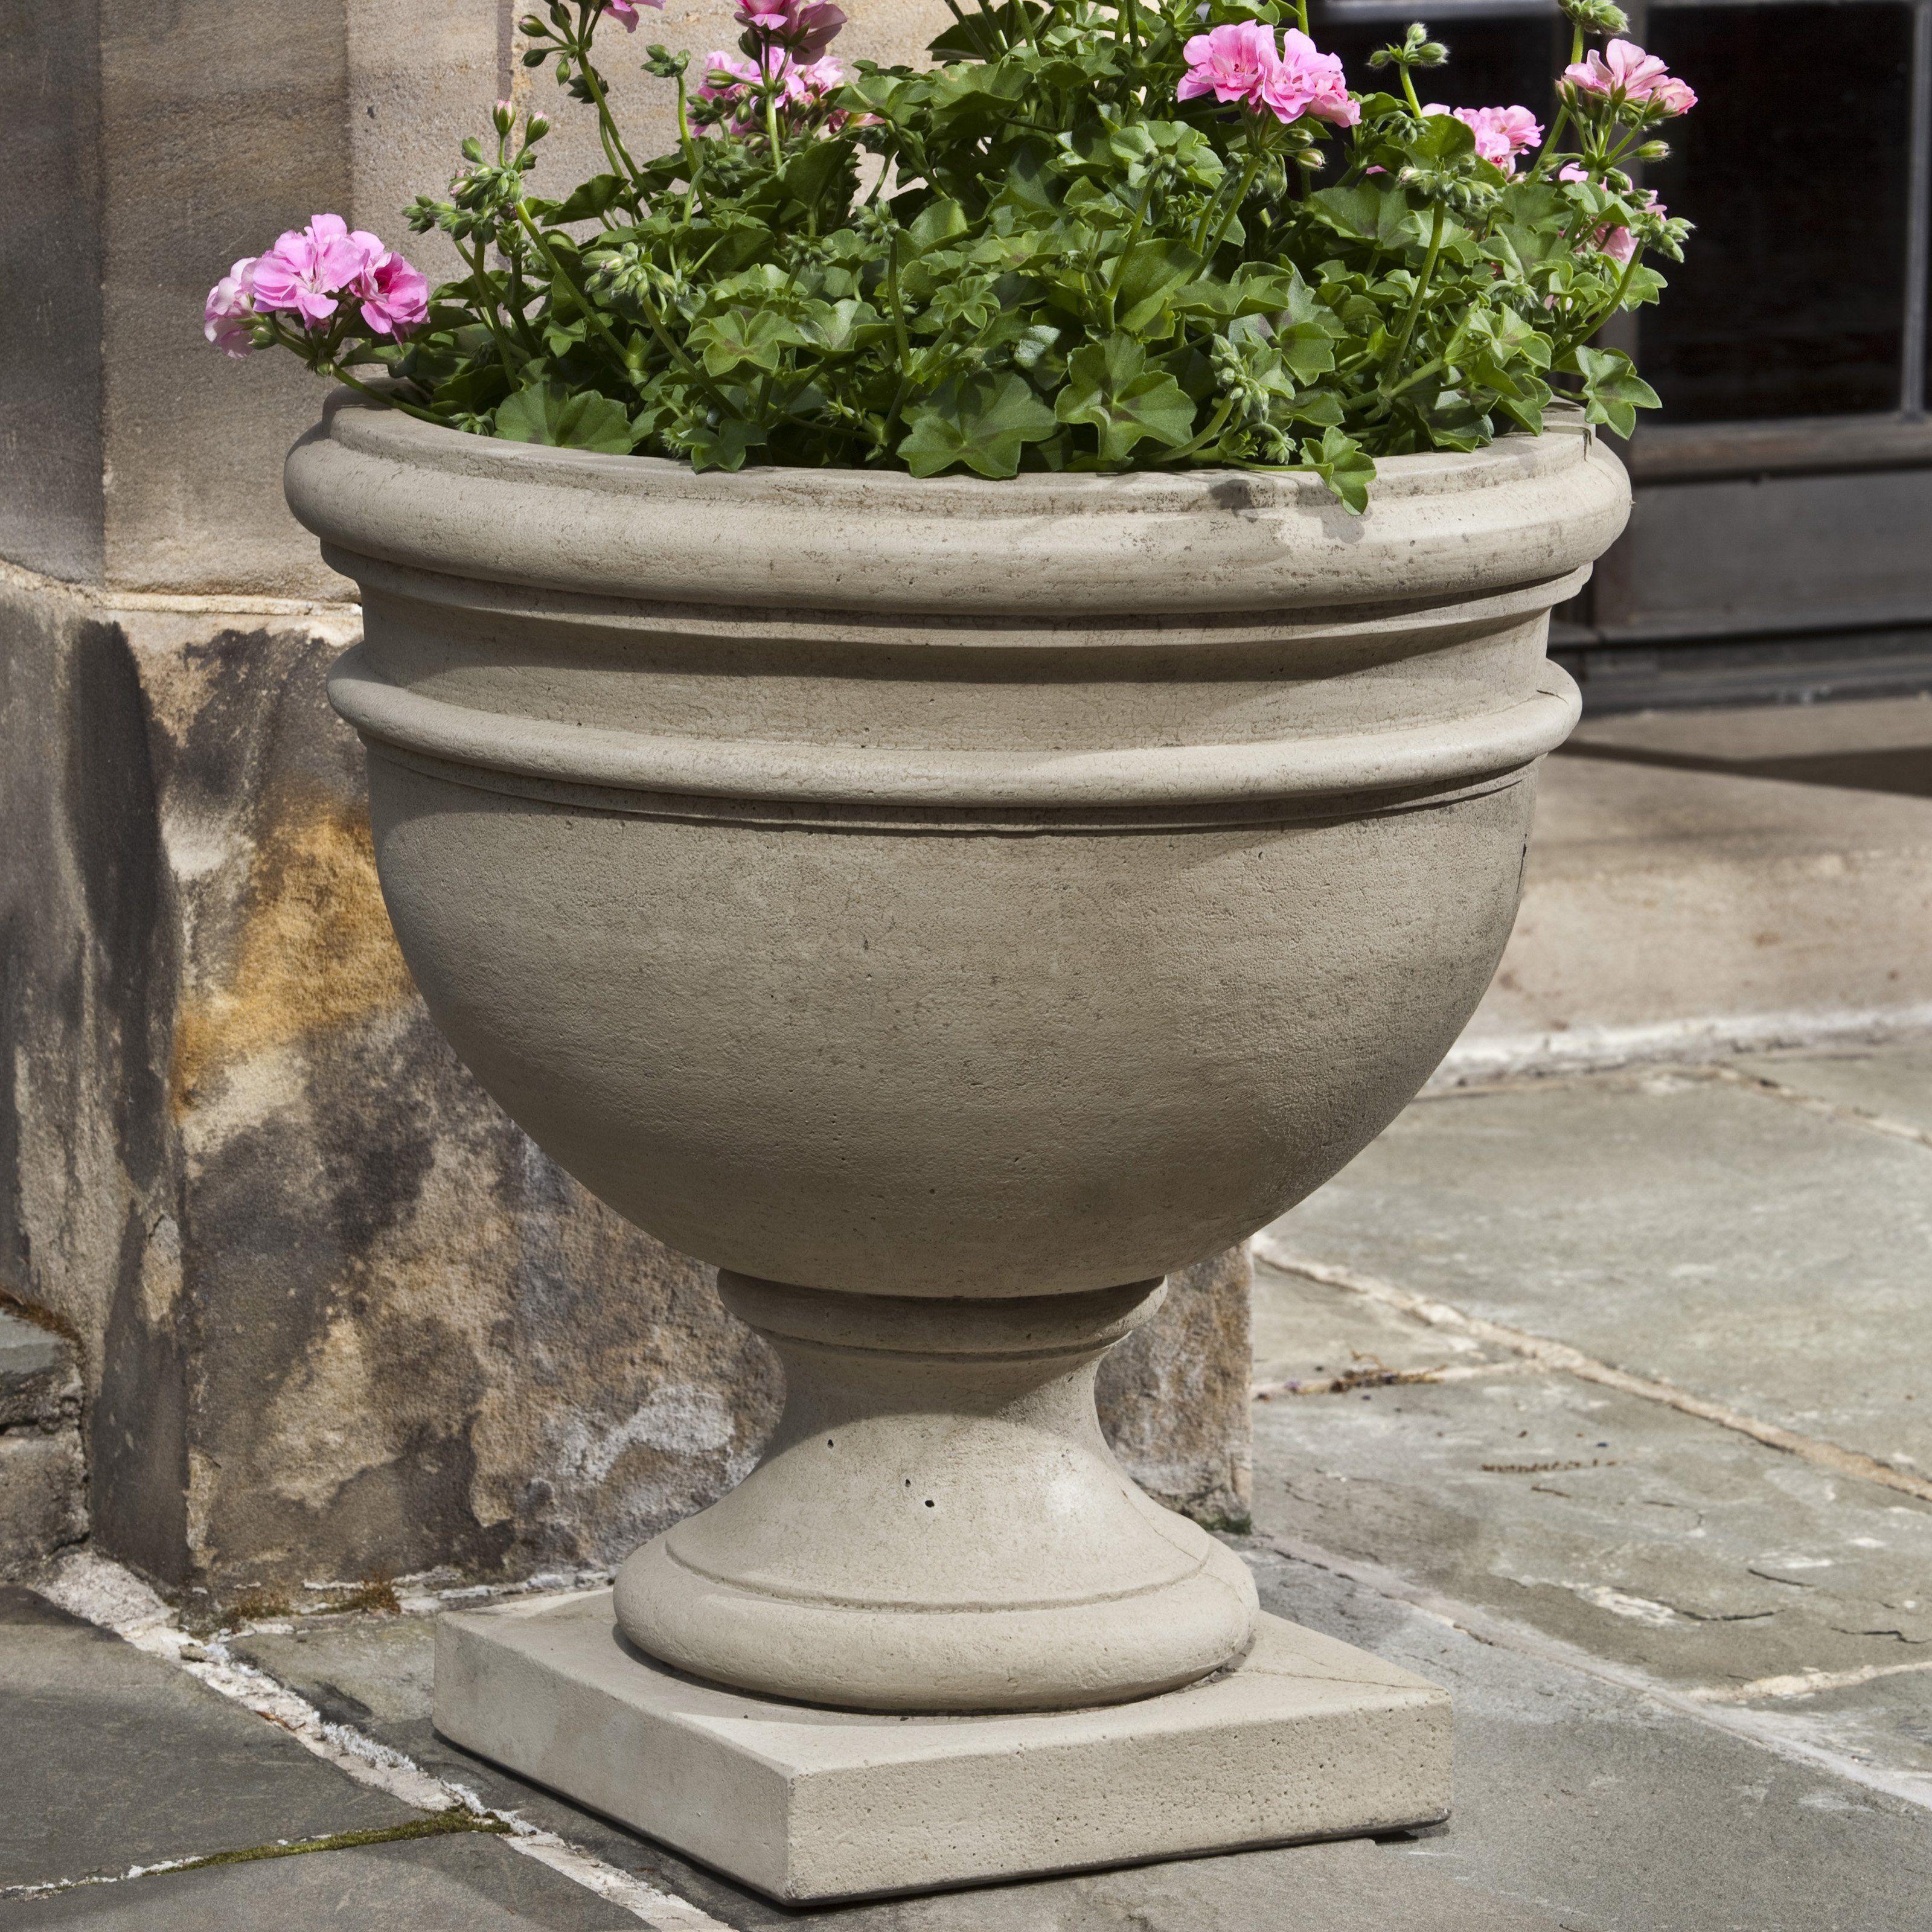 Campania International Montgomery Cast Stone Urn Planter Rustico Verde Travertino